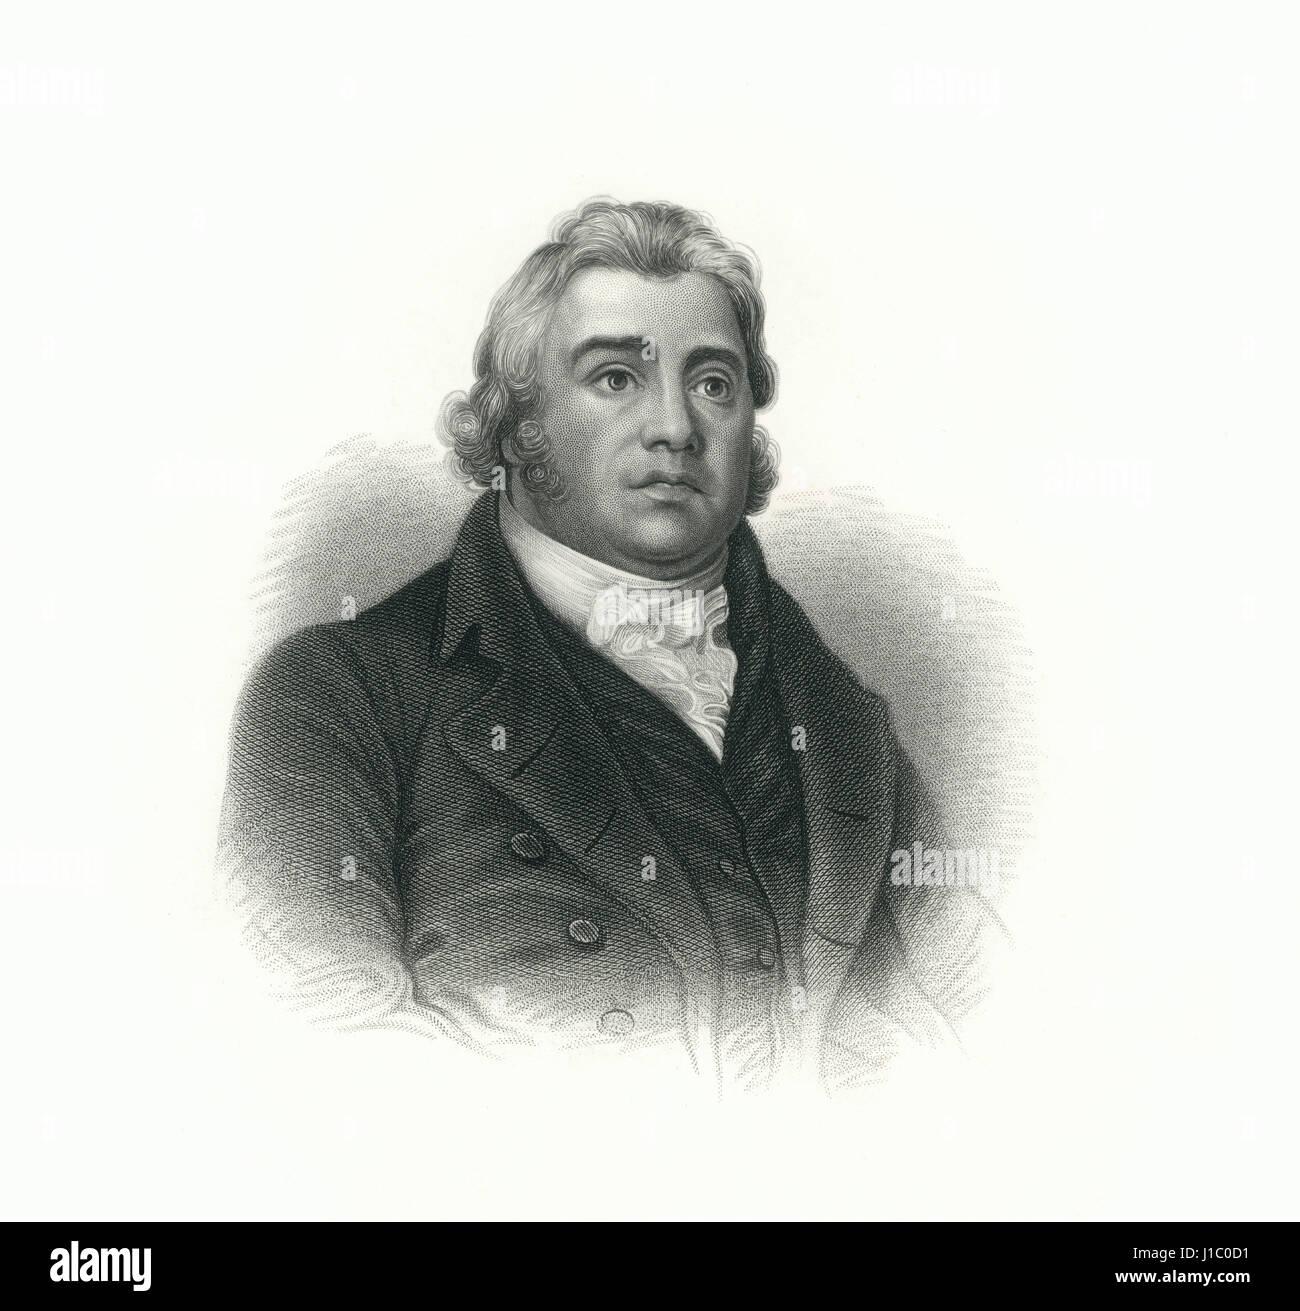 Samuel Taylor Coleridge (1772-1834), English Poet, Philosopher and Founder of Romantic Movement, Engraving, 1876 - Stock Image